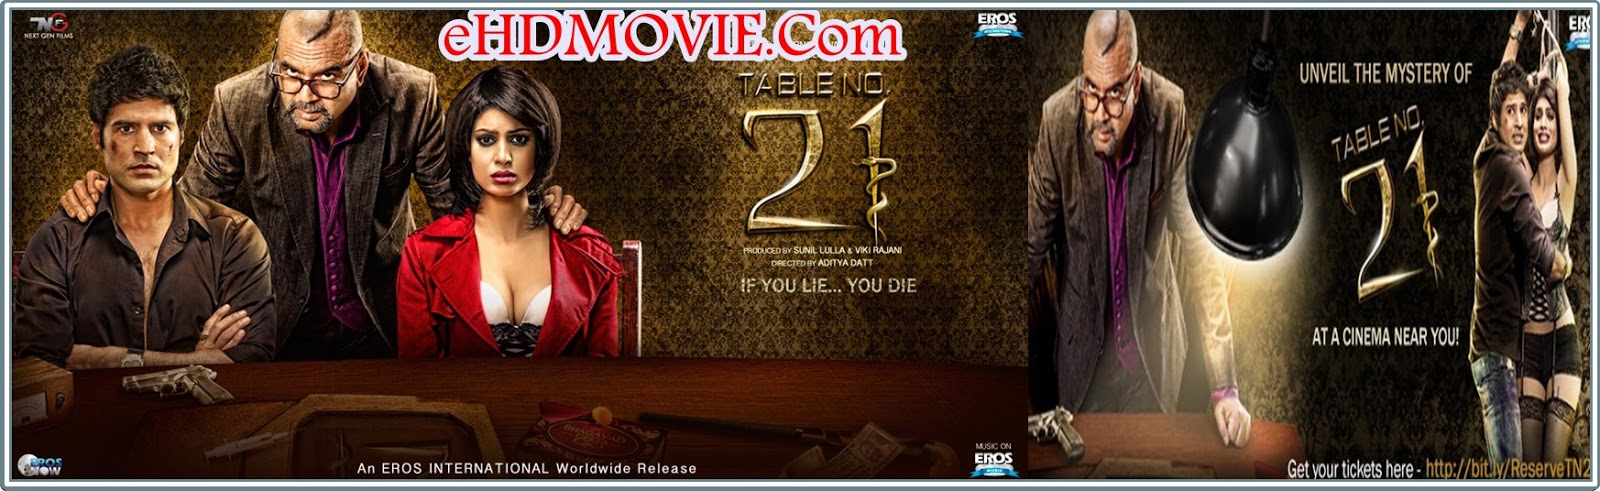 Table No. 21 2013 Full Movie Hindi 720p - 480p ORG BRRip 300MB - 1GB ESubs Free Download